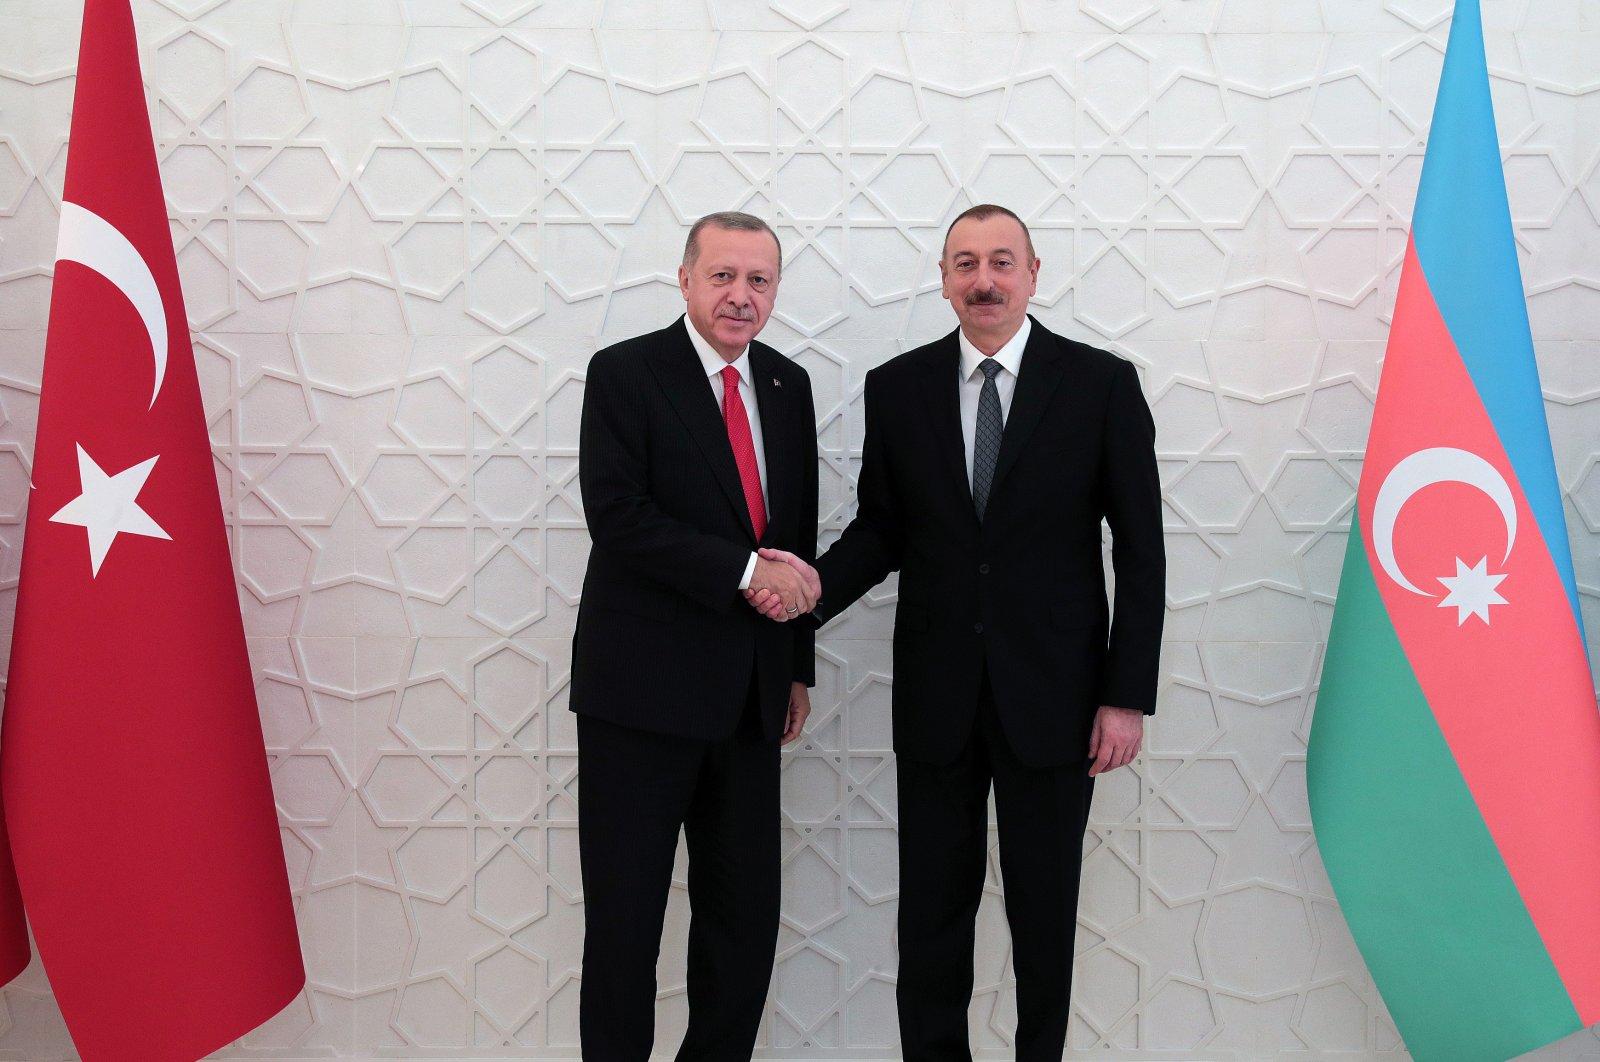 President Recep Tayyip Erdoğan shakes hand with Azeri President Ilham Aliyev, Baku, Nov. 15, 2019. (AA)